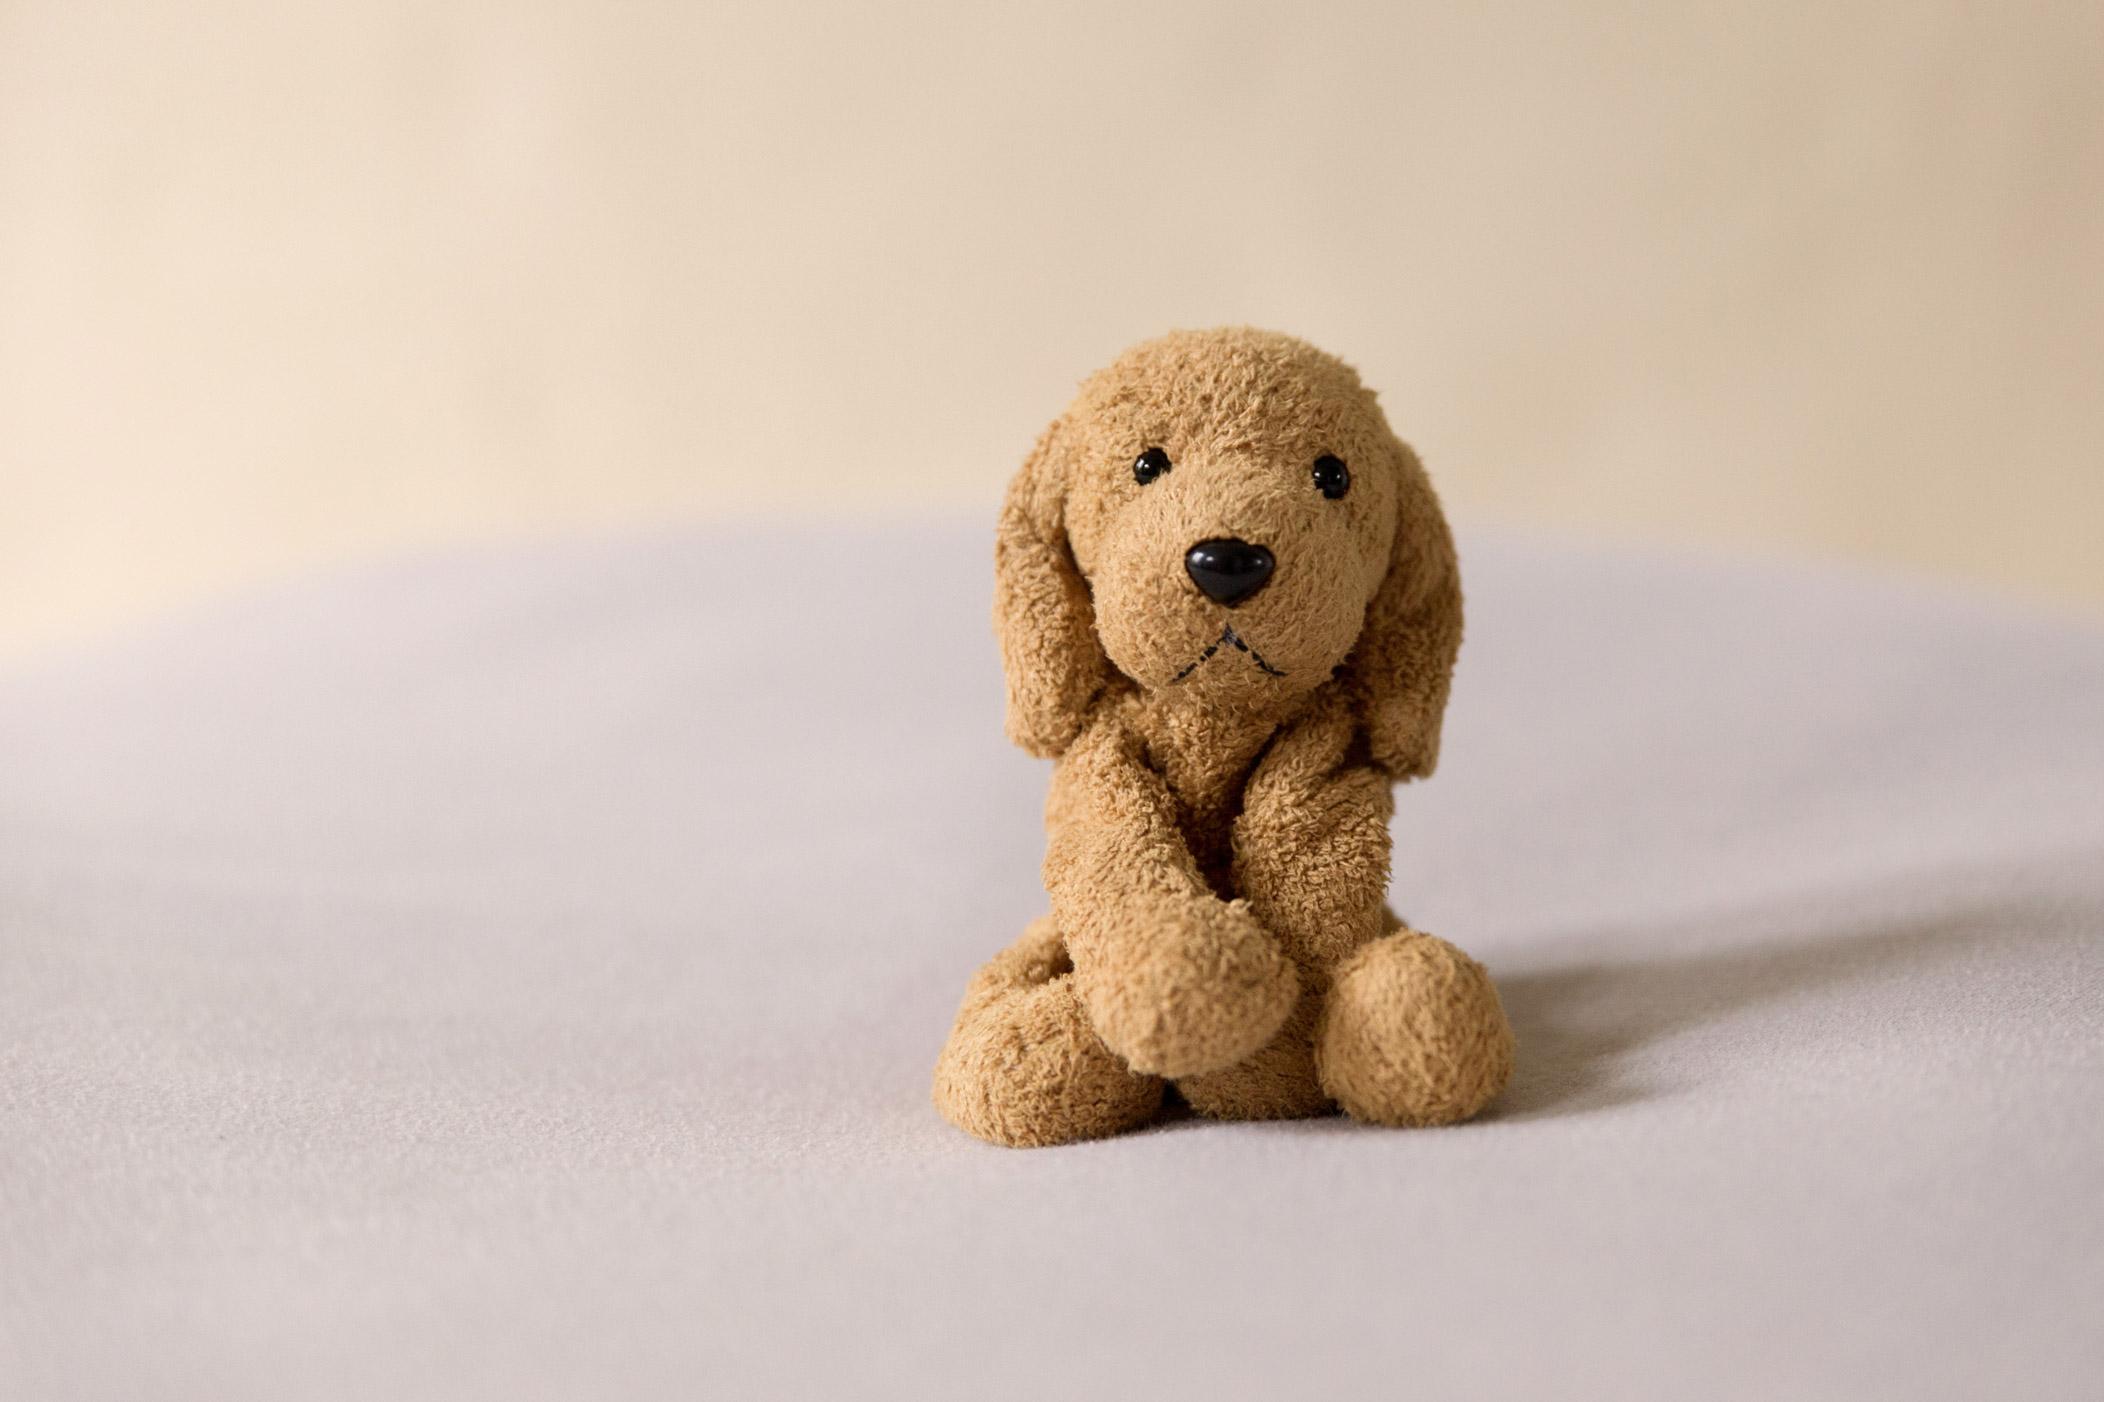 newborn-photos-st-albans-props-doggy-bear.jpg